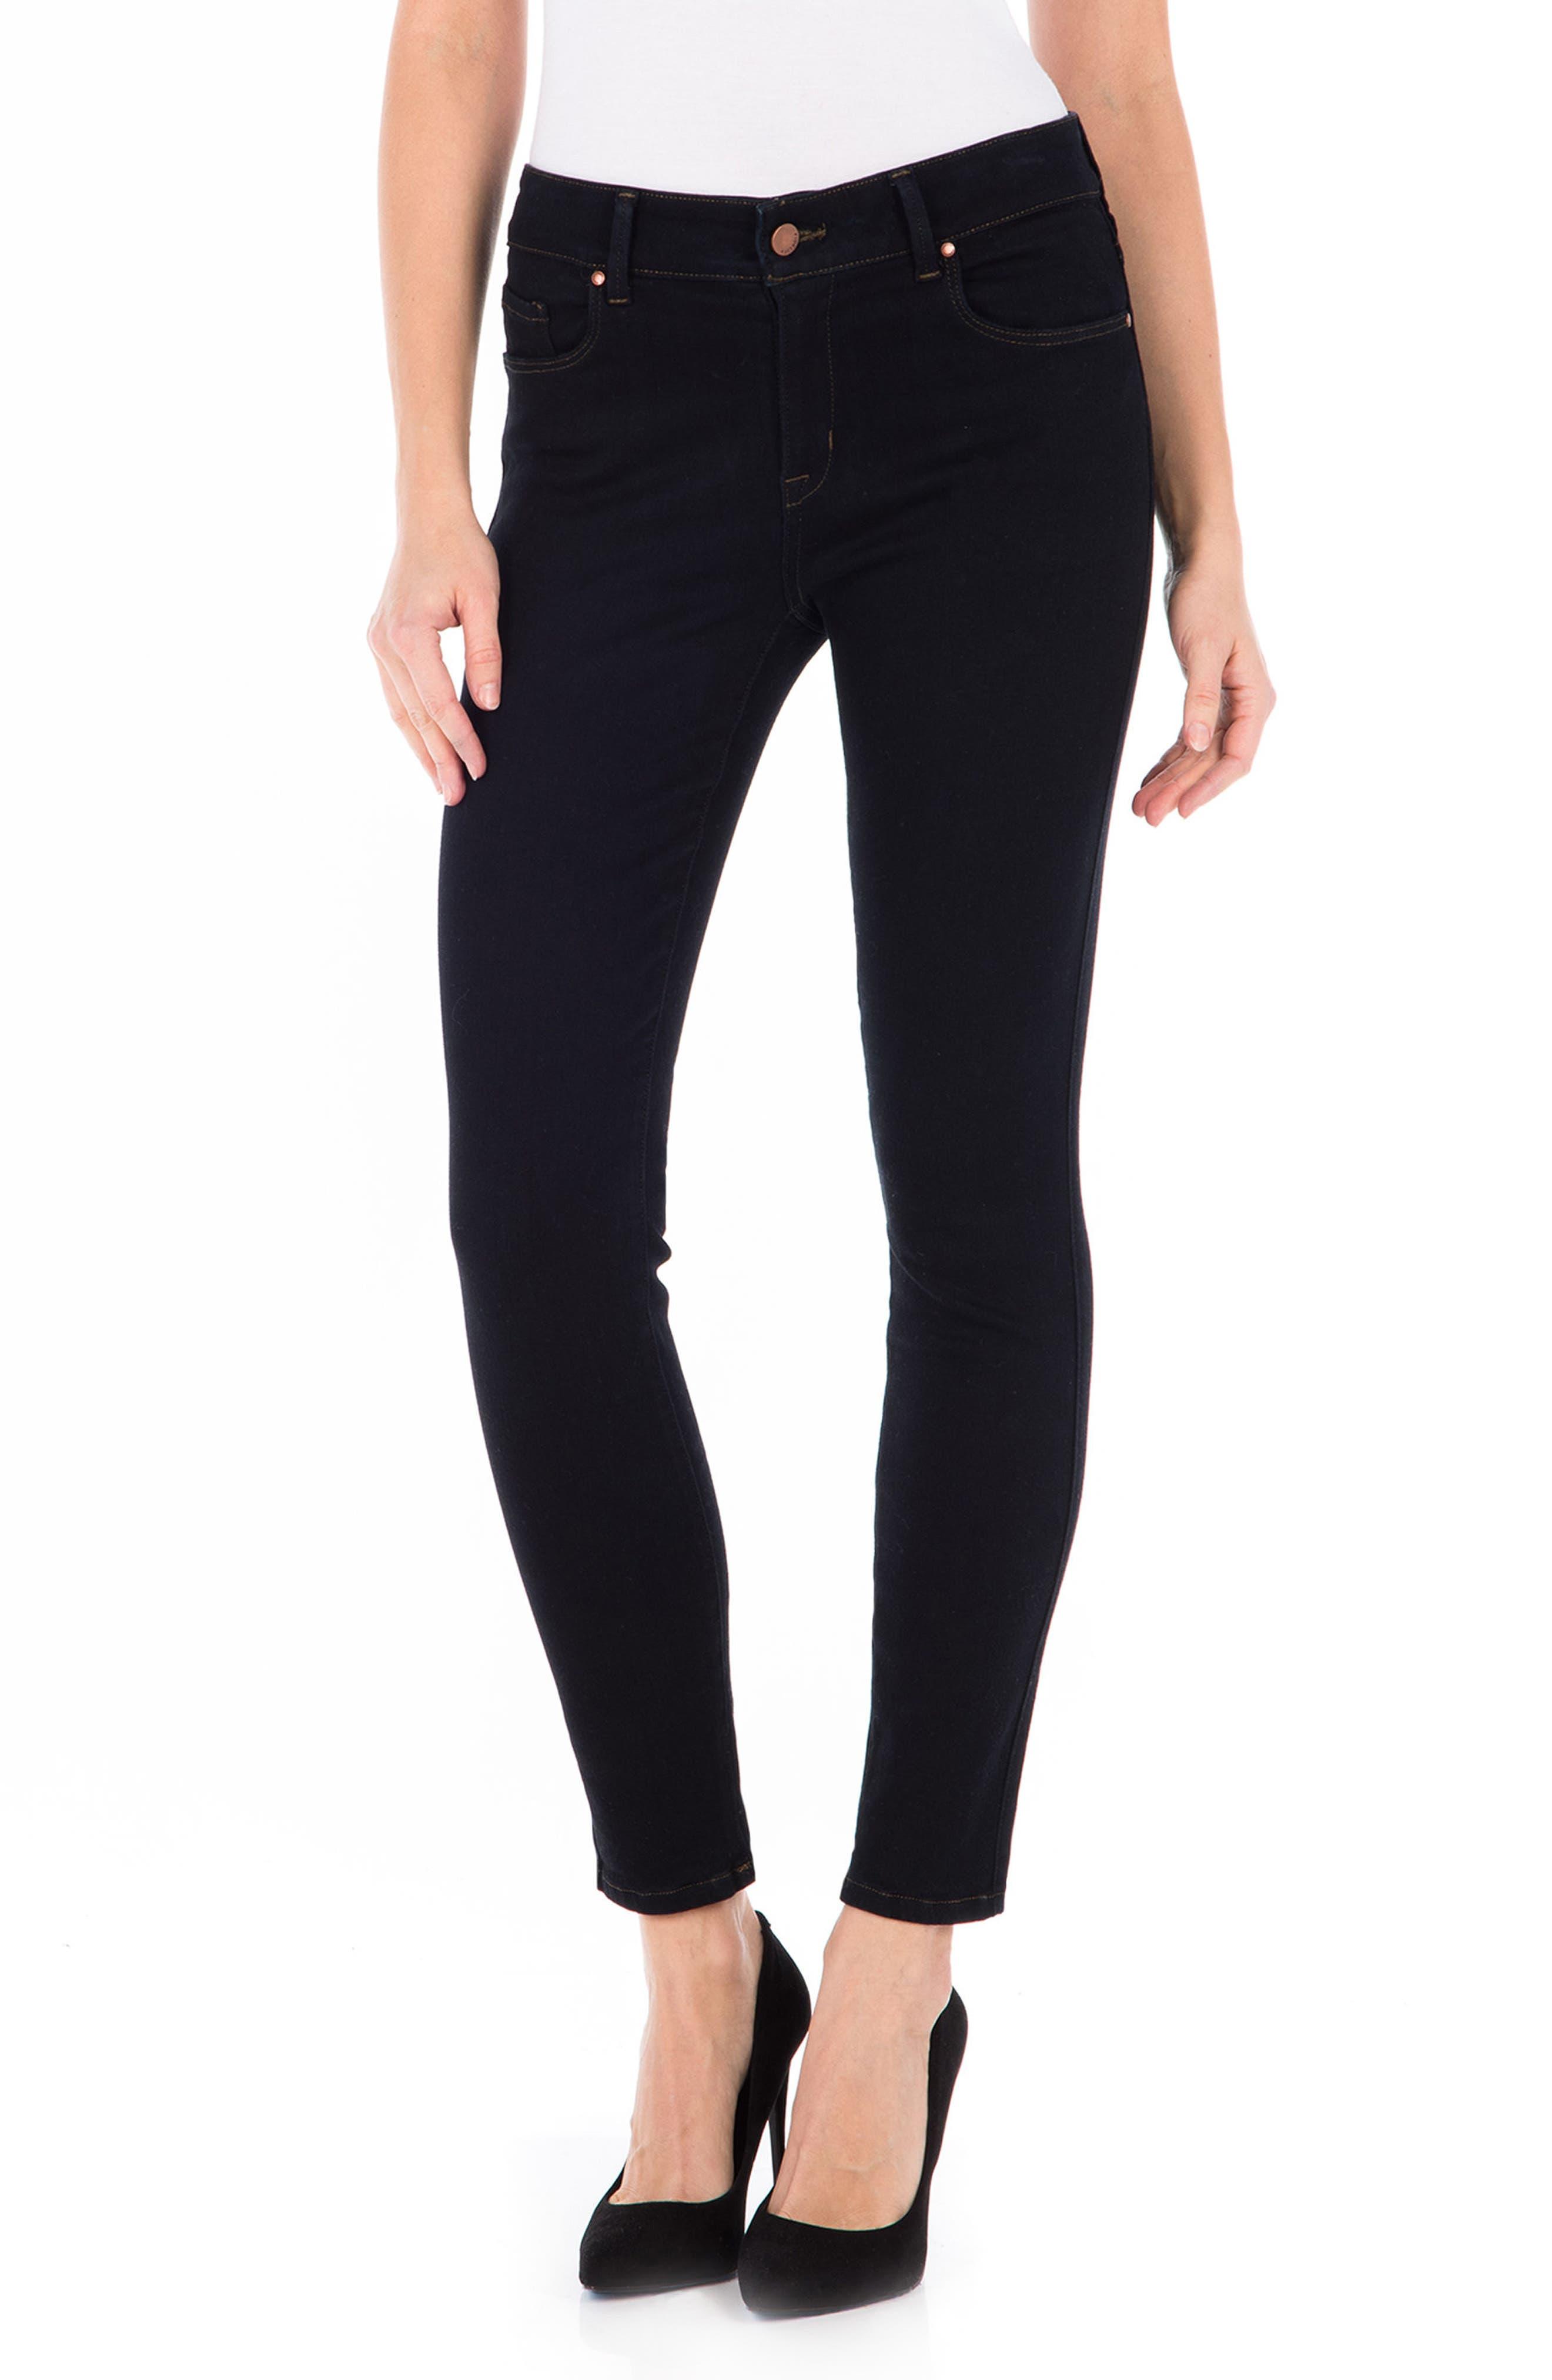 Sola Skinny Jeans,                             Main thumbnail 1, color,                             Navy Noir